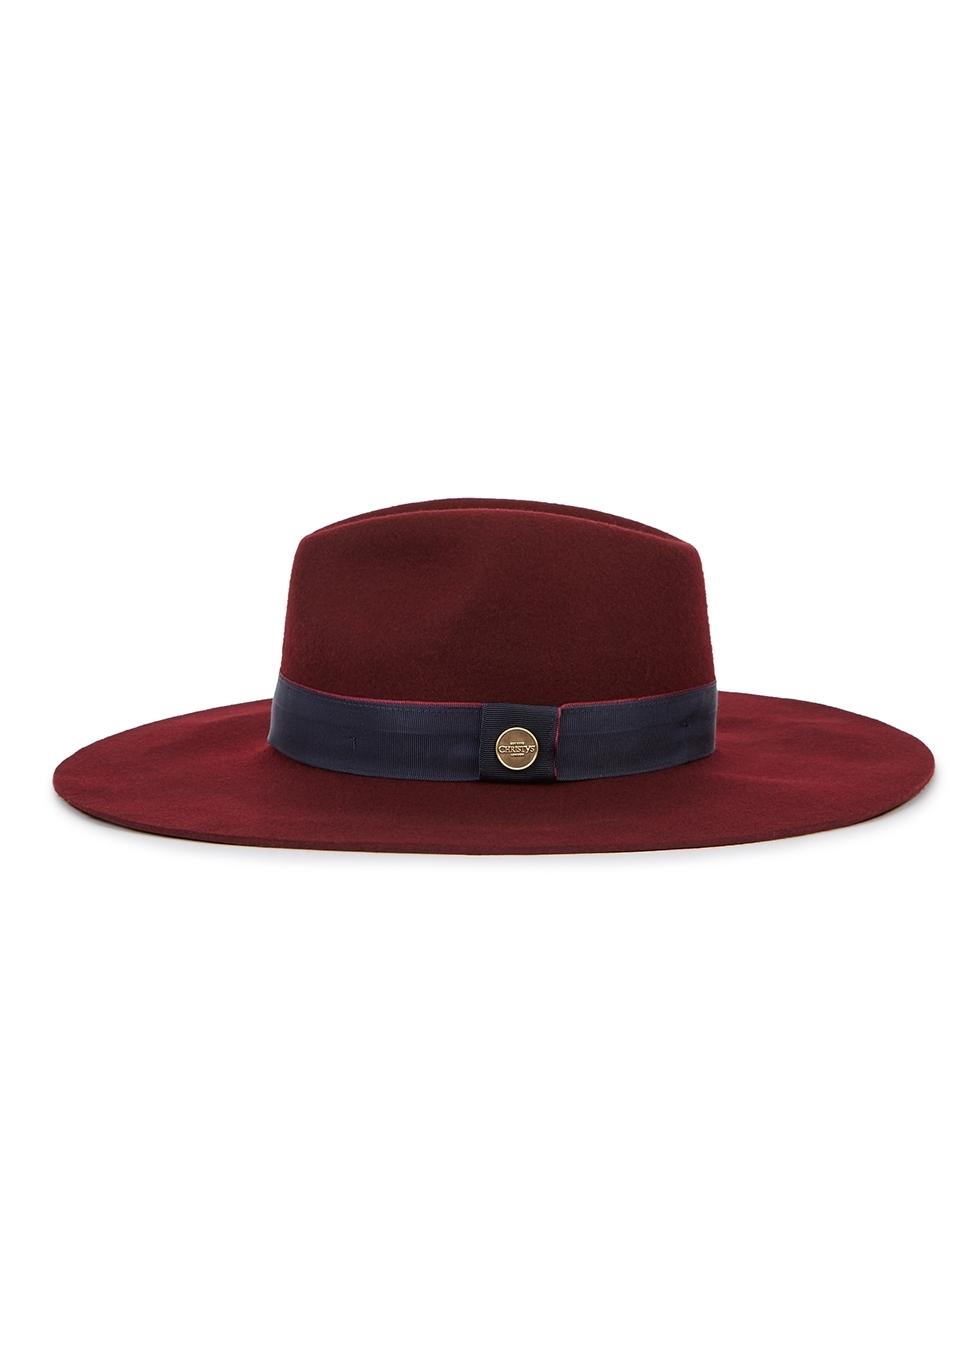 b021e63d867 Designer Fedoras & Trilbys - Women's Hats - Harvey Nichols